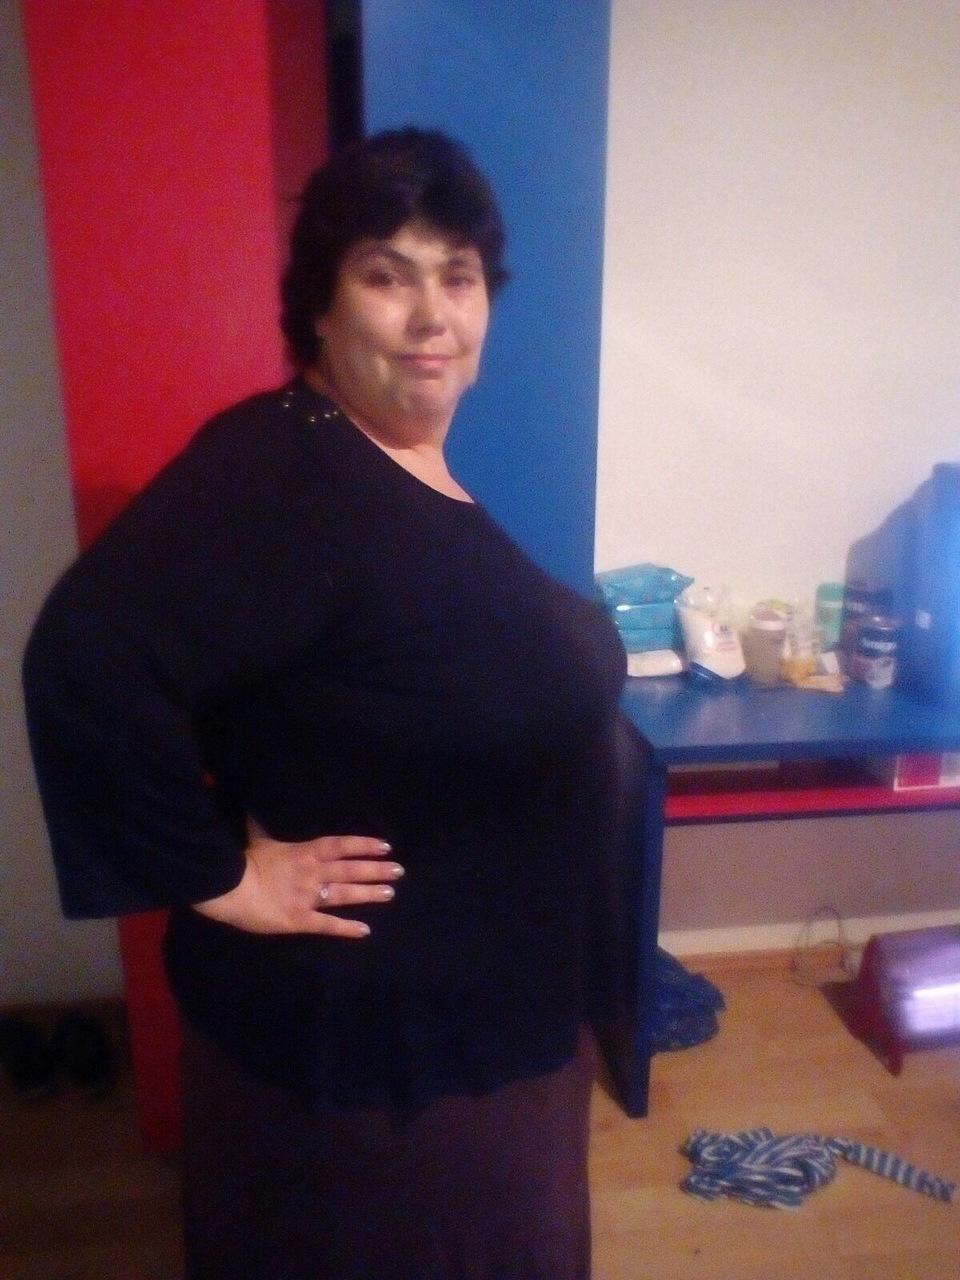 Si-a pus inel gastric si a slabit 15 kilograme! Asa arata acum Ioana Tufaru, dupa ce in urma cu doua luni cantarea 165 de kilograme! FOTO EXCLUSIV!